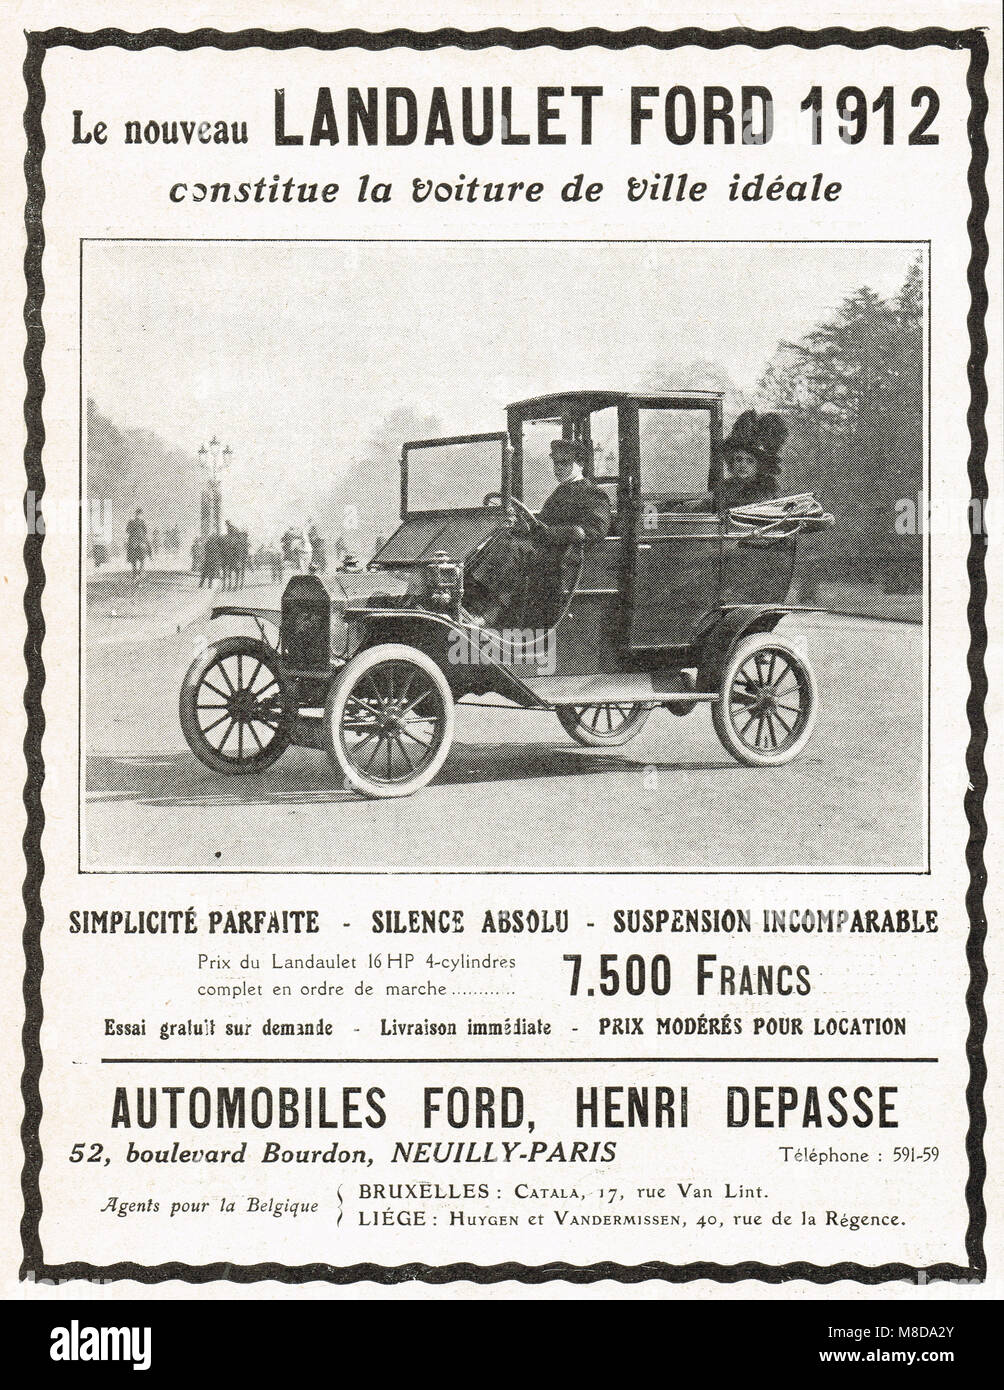 French language advert, Ford landaulet, 1912 - Stock Image